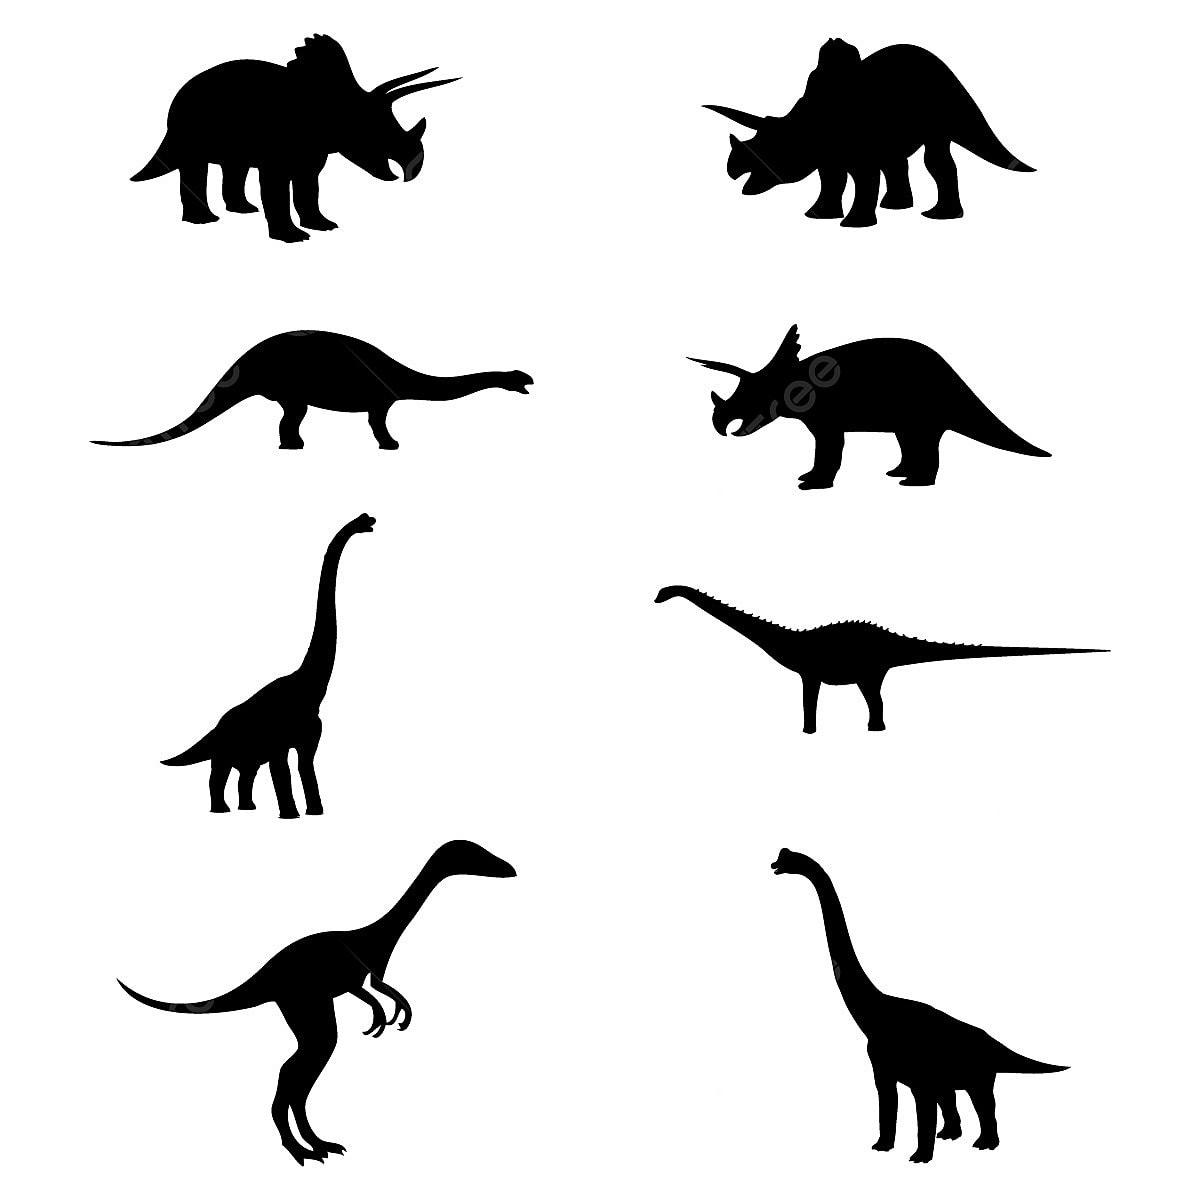 dinosaur silhouette ancien animal brachiosaurus png et